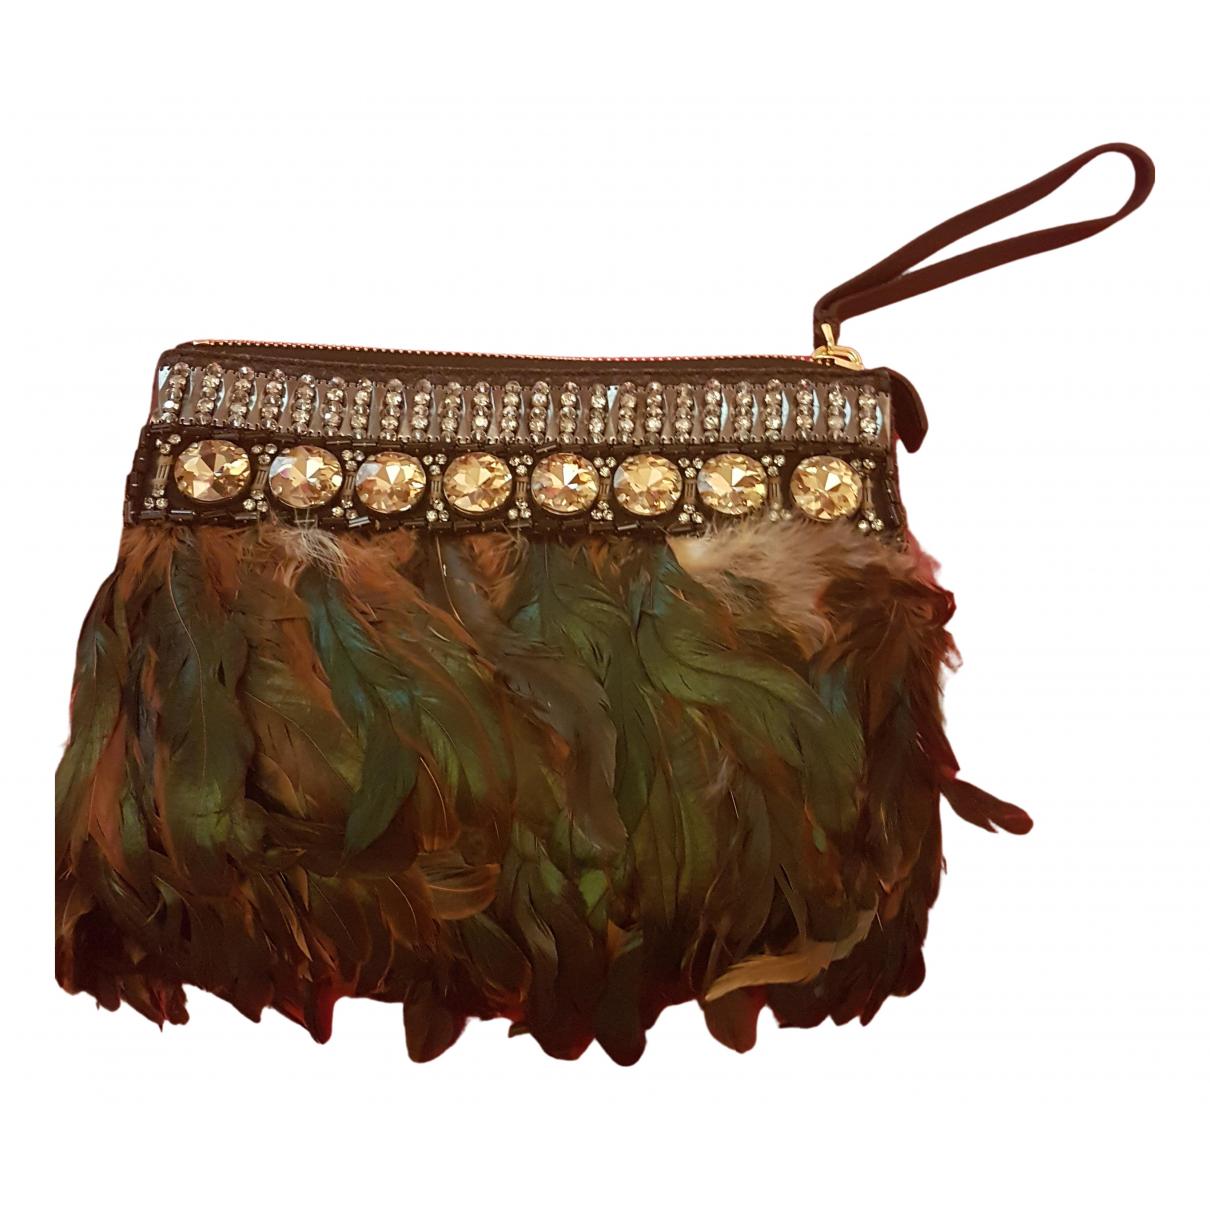 Marni \N Multicolour Leather Clutch bag for Women \N